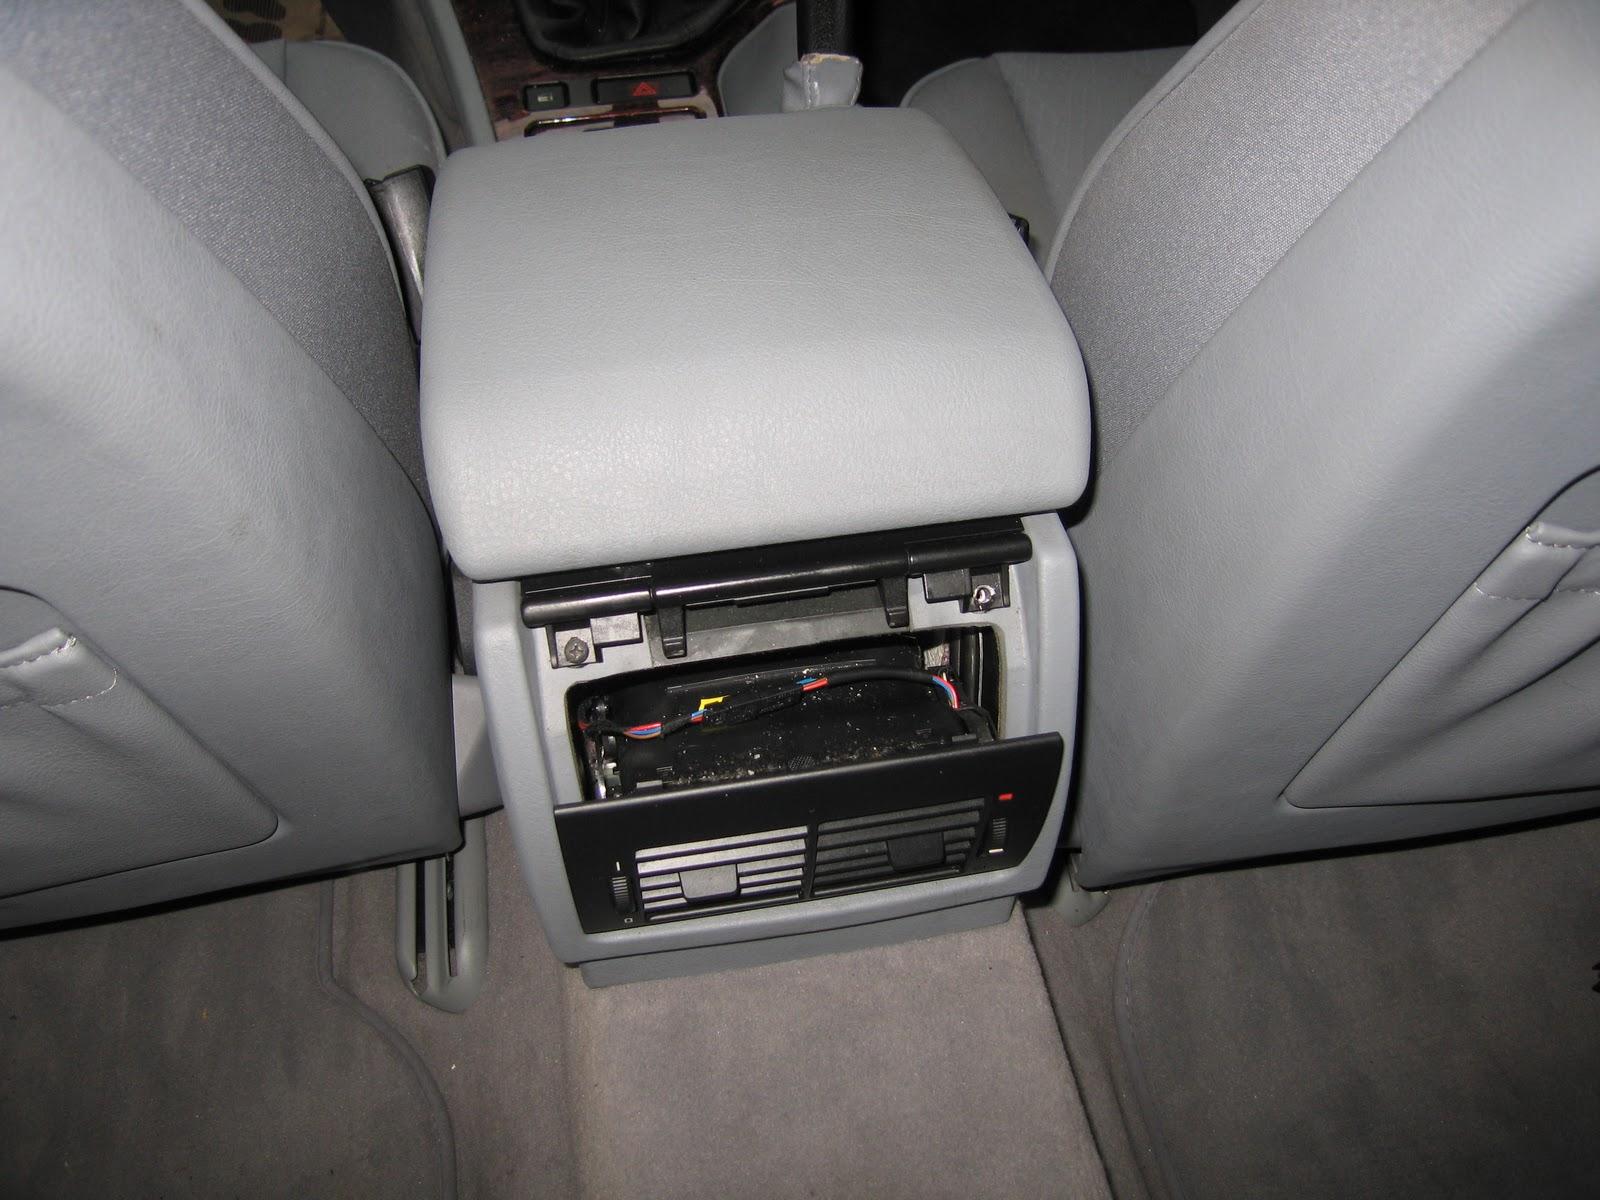 Bmw 328i Radio Stereo 6 Speaker System Wiring Diagram